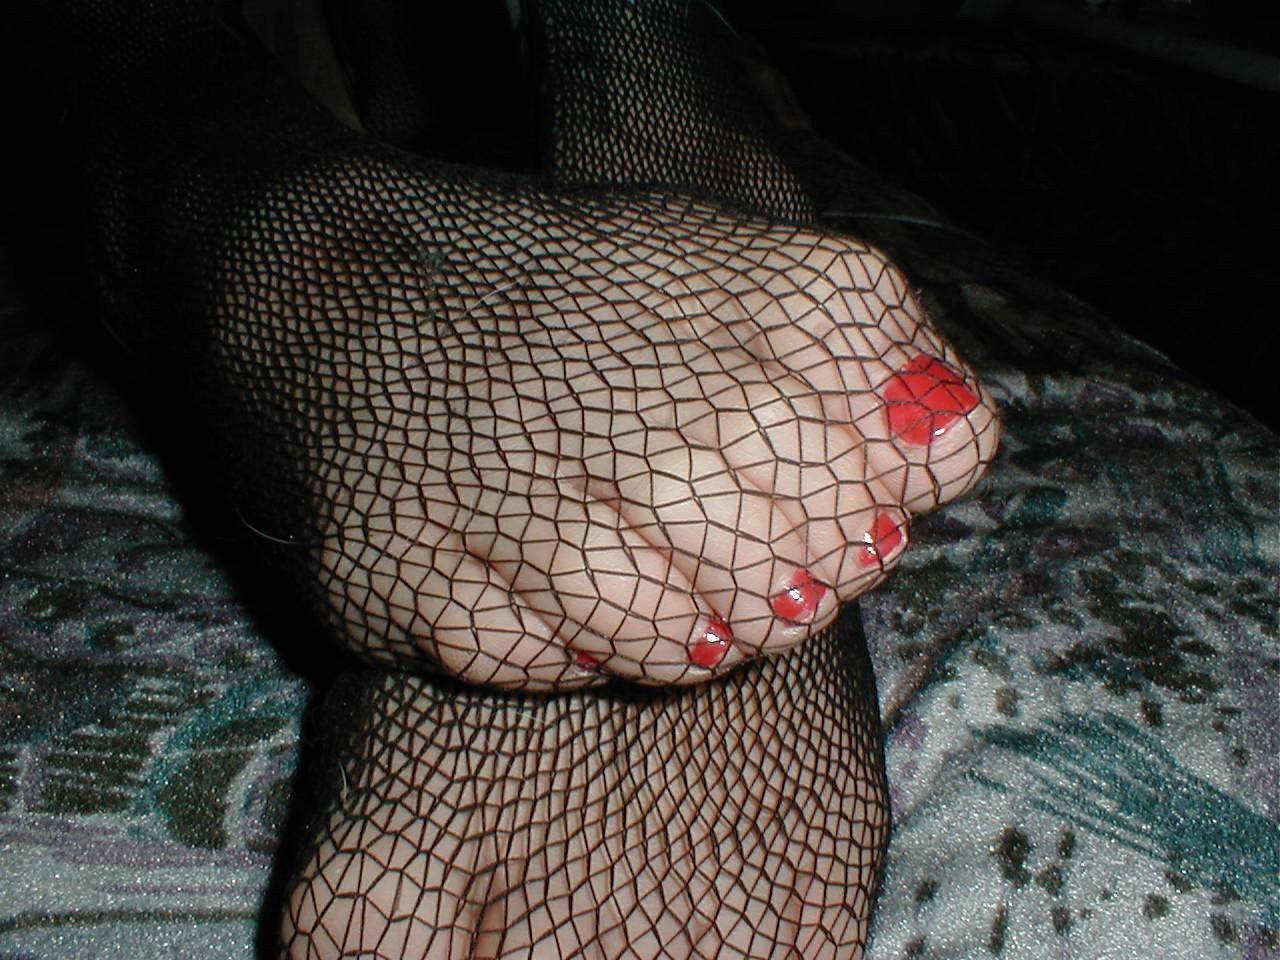 http://pbs-2.adult-empire.com/85/8570/021/pic/10.jpg